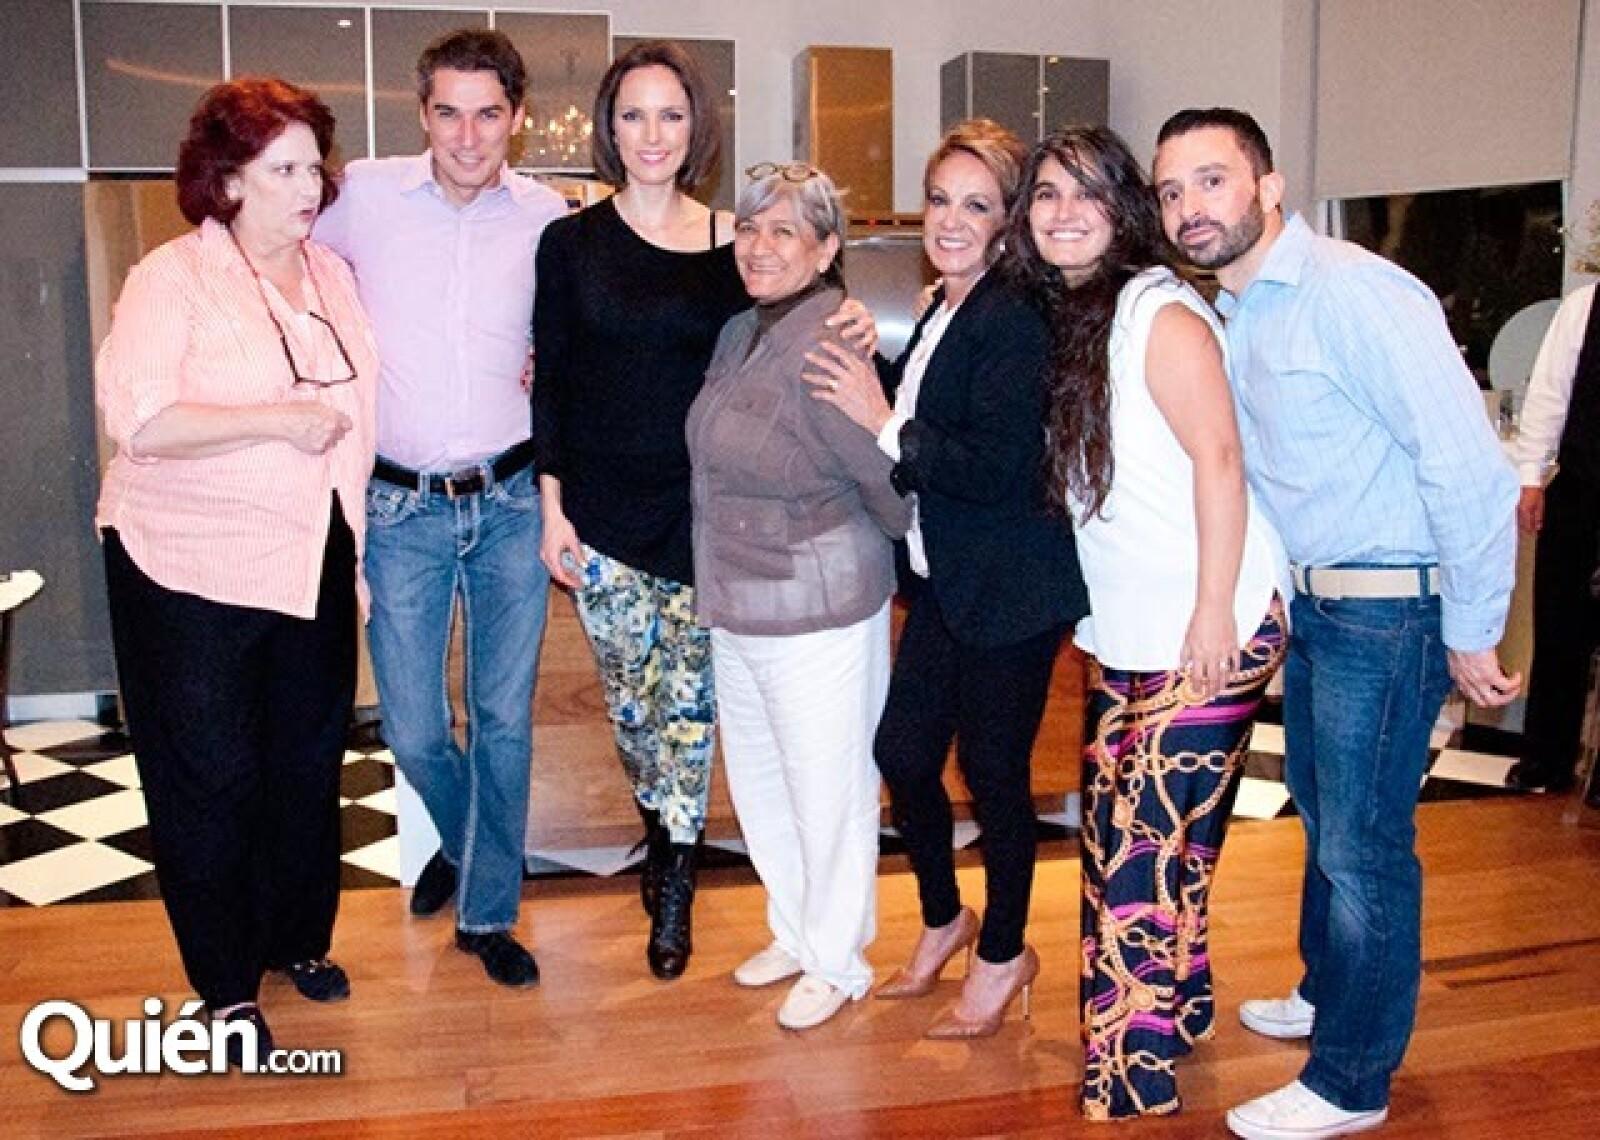 Bernadette Larrañaga, Pedro Vázquez, Natalia Fernández, Charo García, Chiqui Quintana, Charo Islas y Santiago Parra